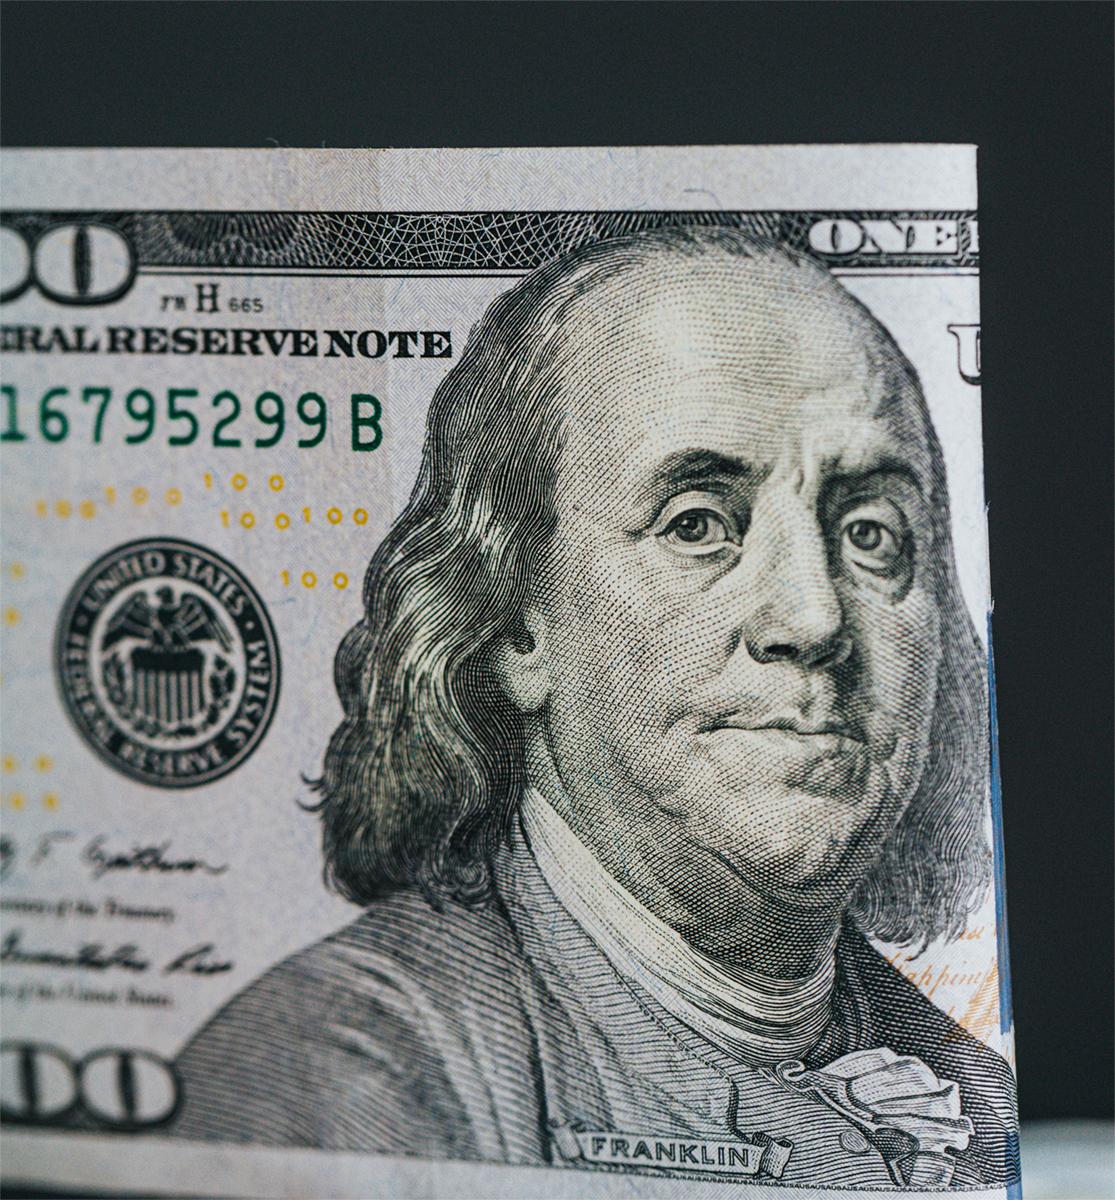 Close up of $100 bill